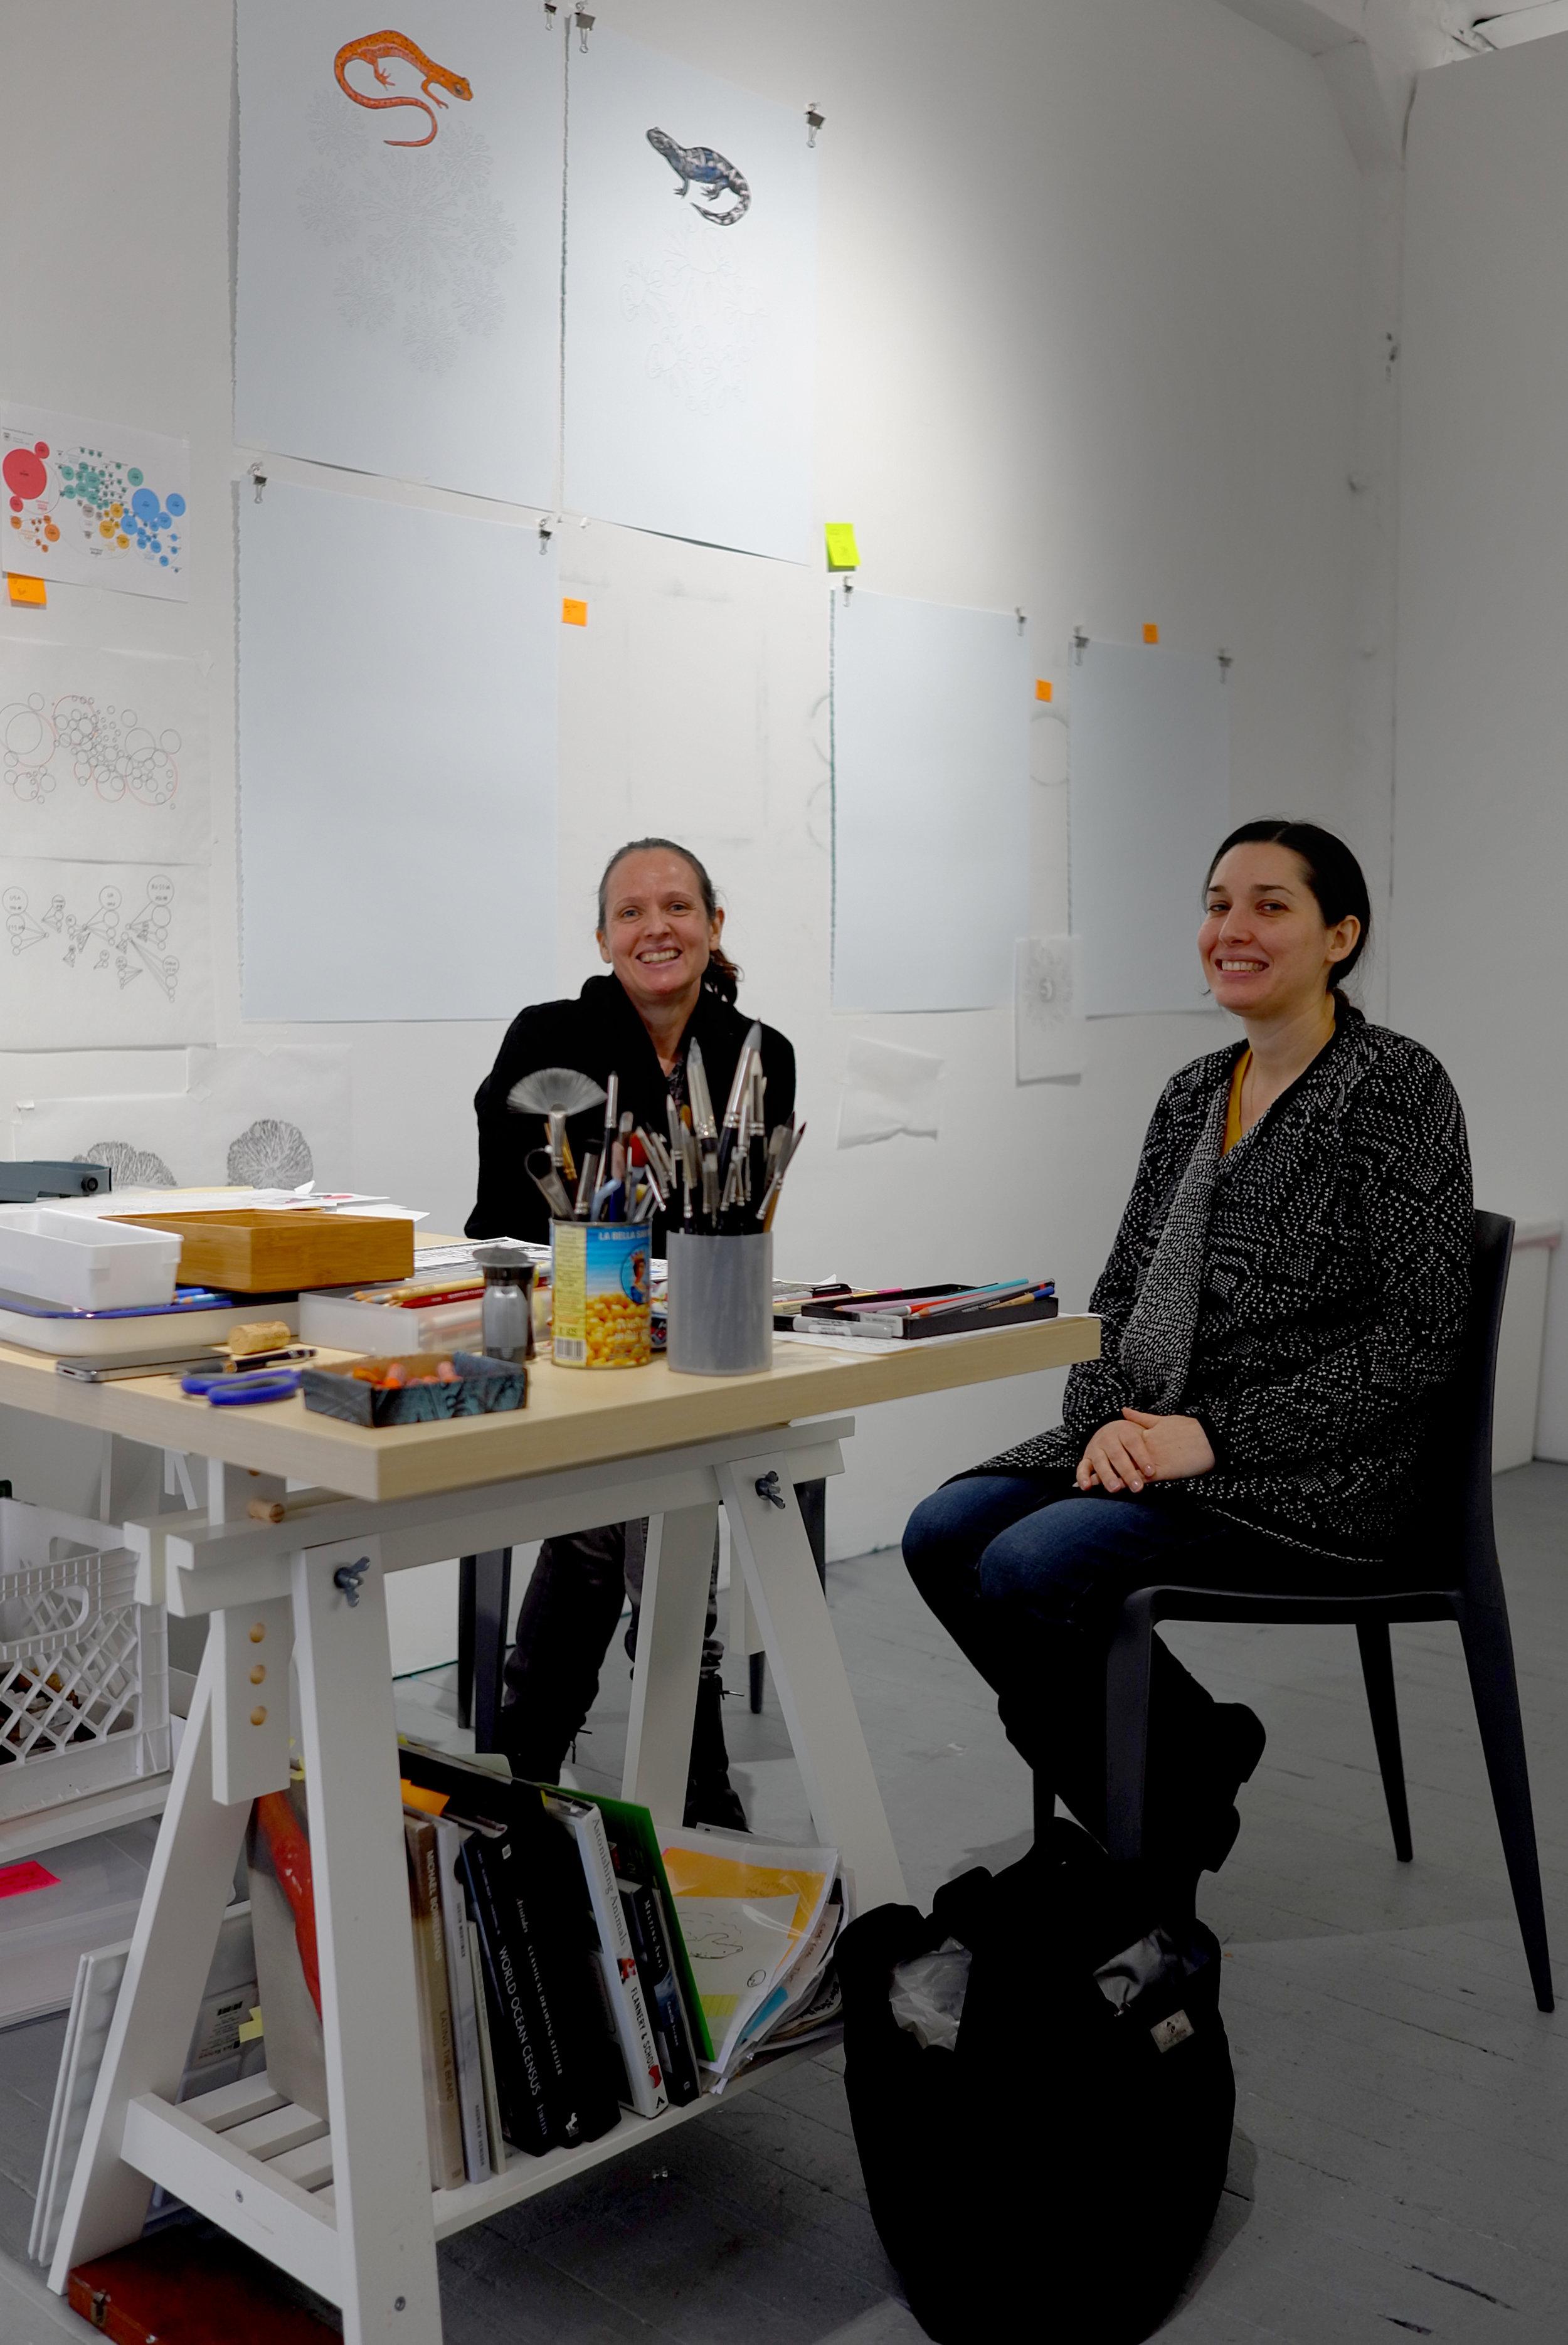 Studio visit, January 2017